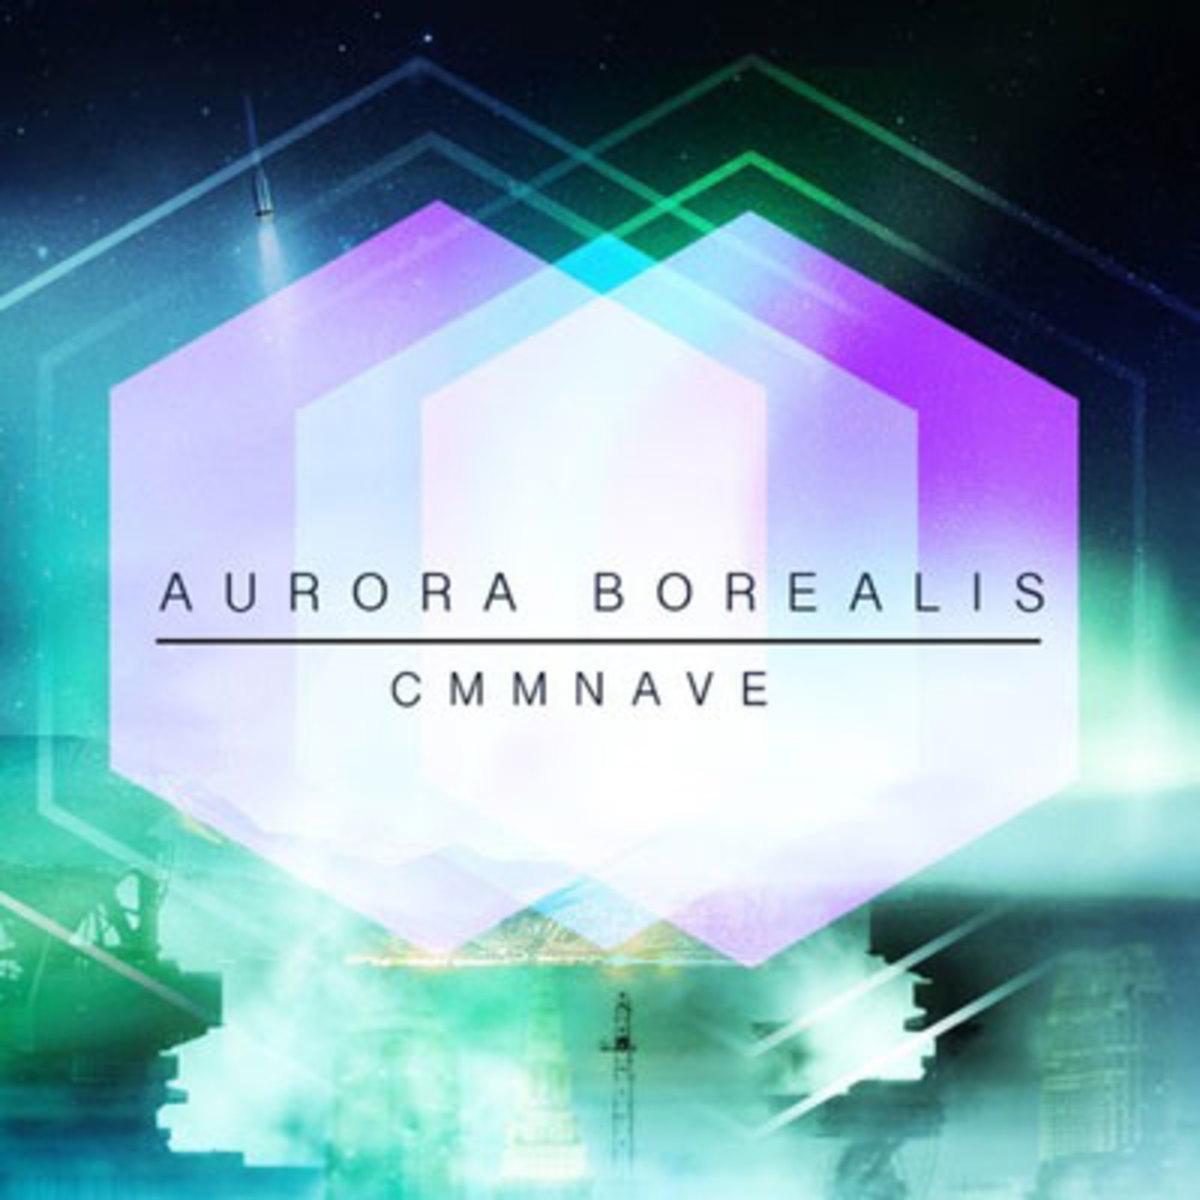 cmmnave-aurorabor.jpg